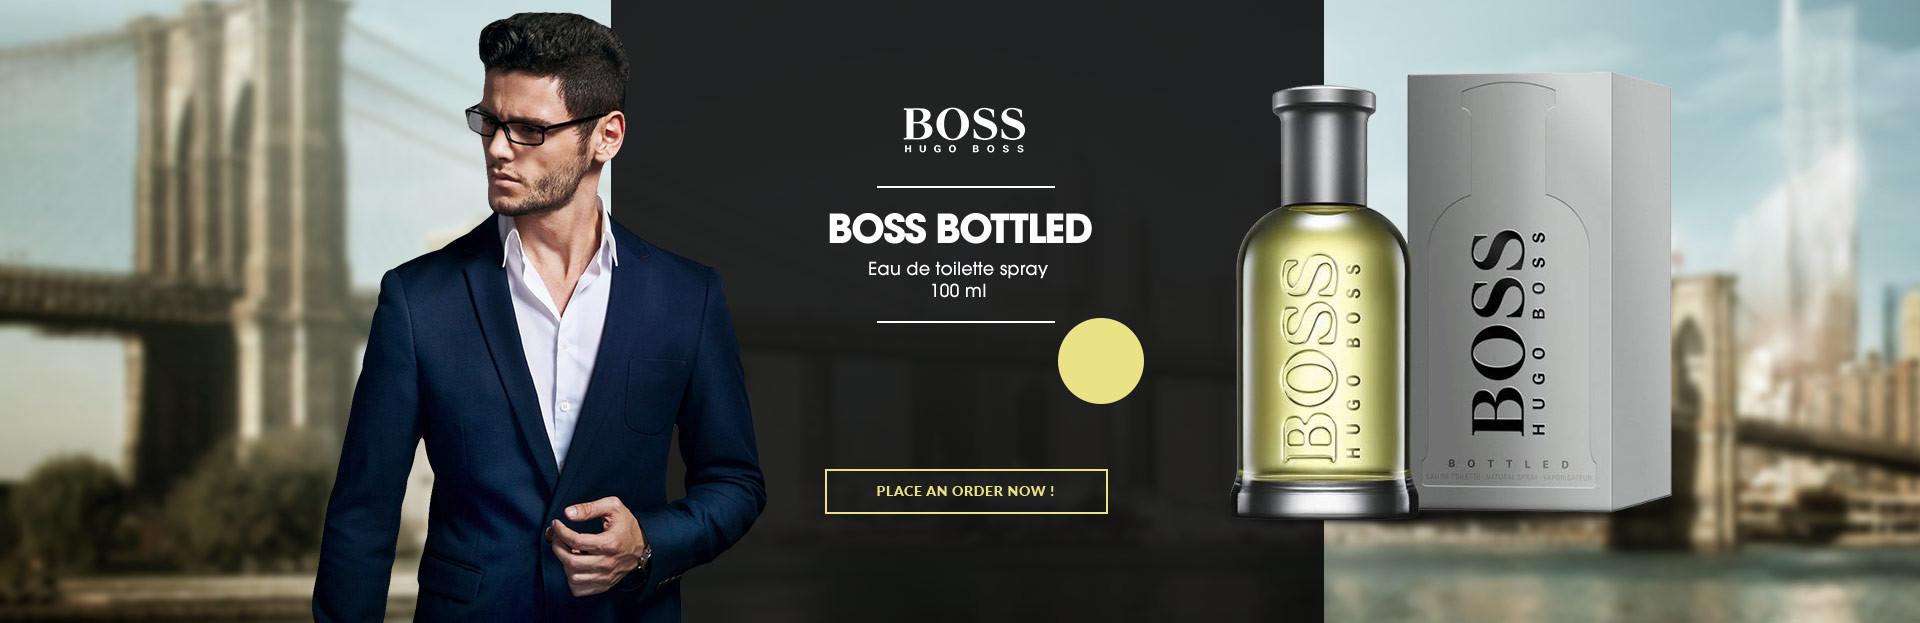 Low Priced Perfume For Men And Women 100 Authentic Sobelia Bri Calvin Klein Eternity Edp Ml Has 250000 Customers